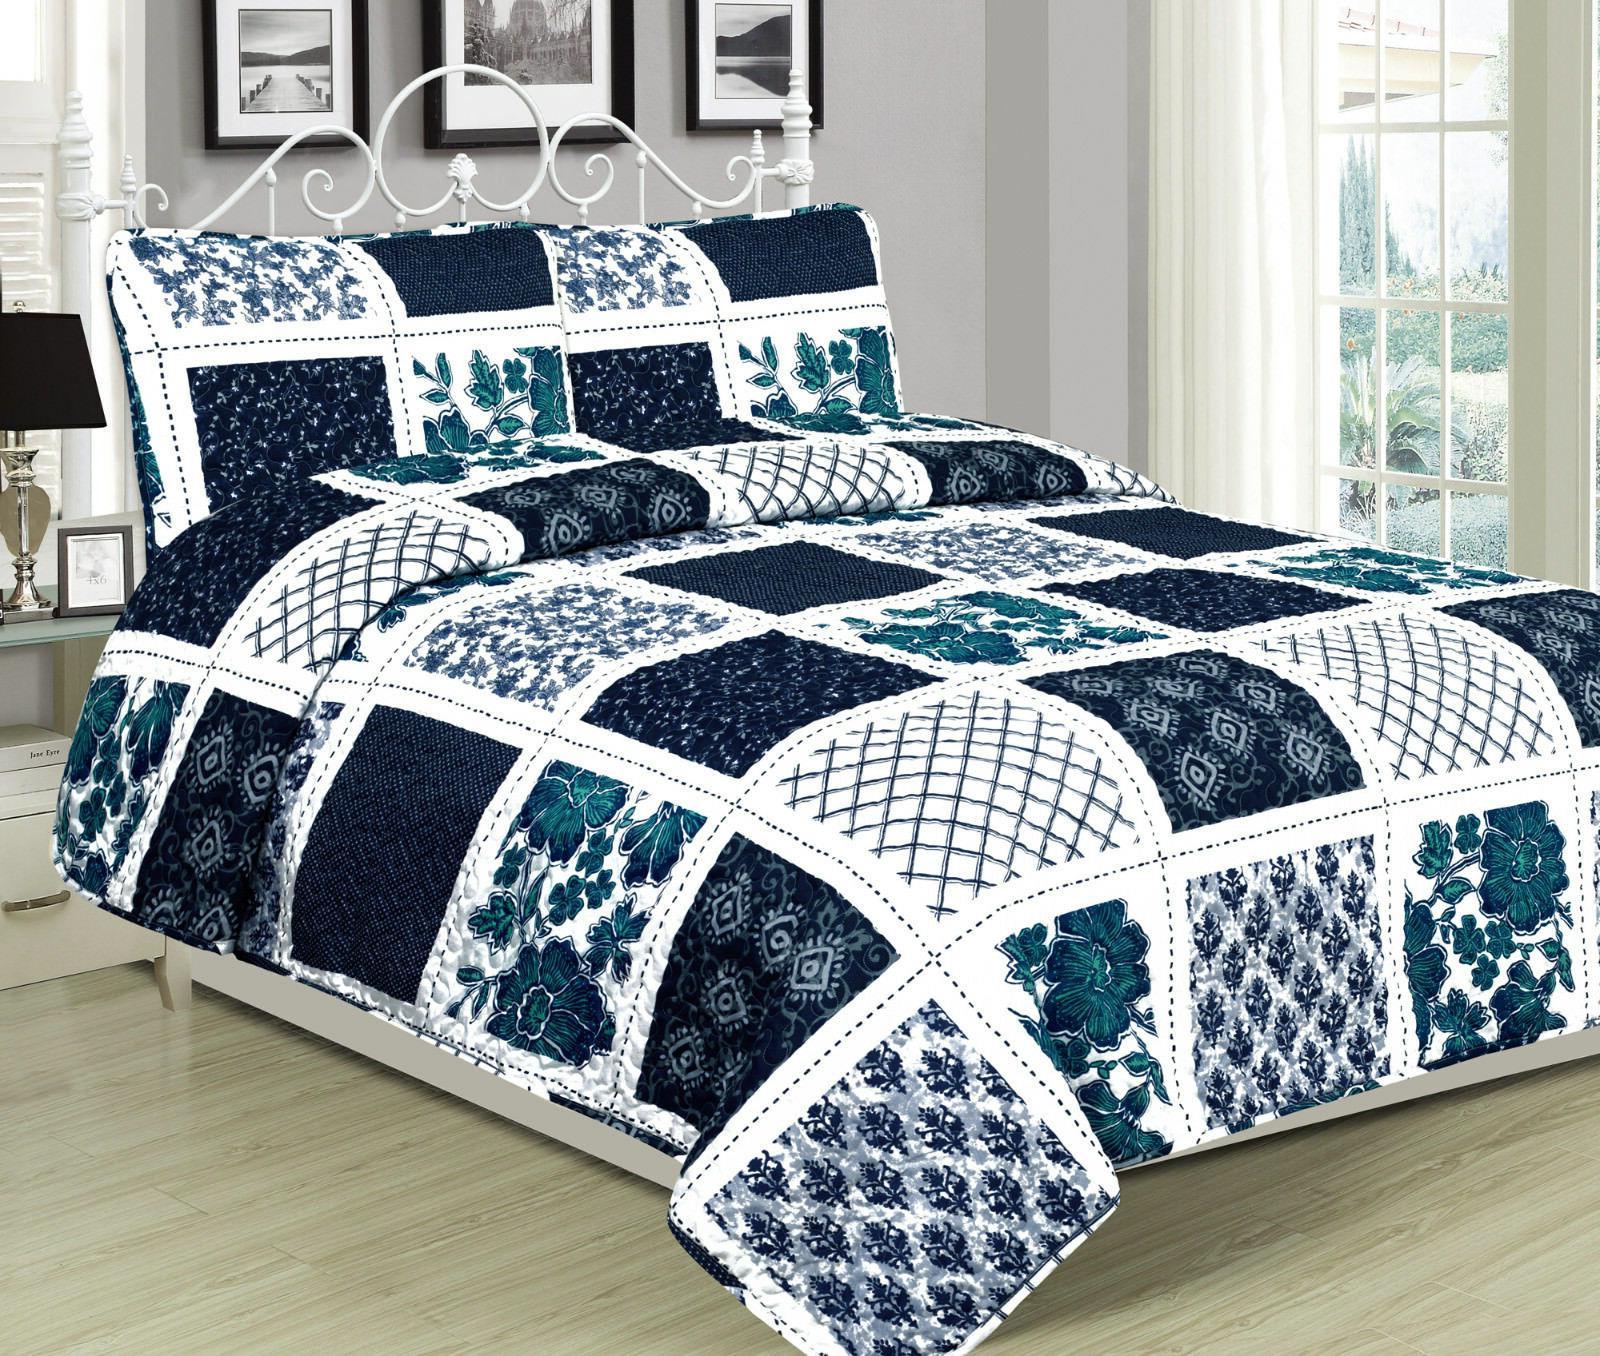 twin queen or king quilt patchwork navy